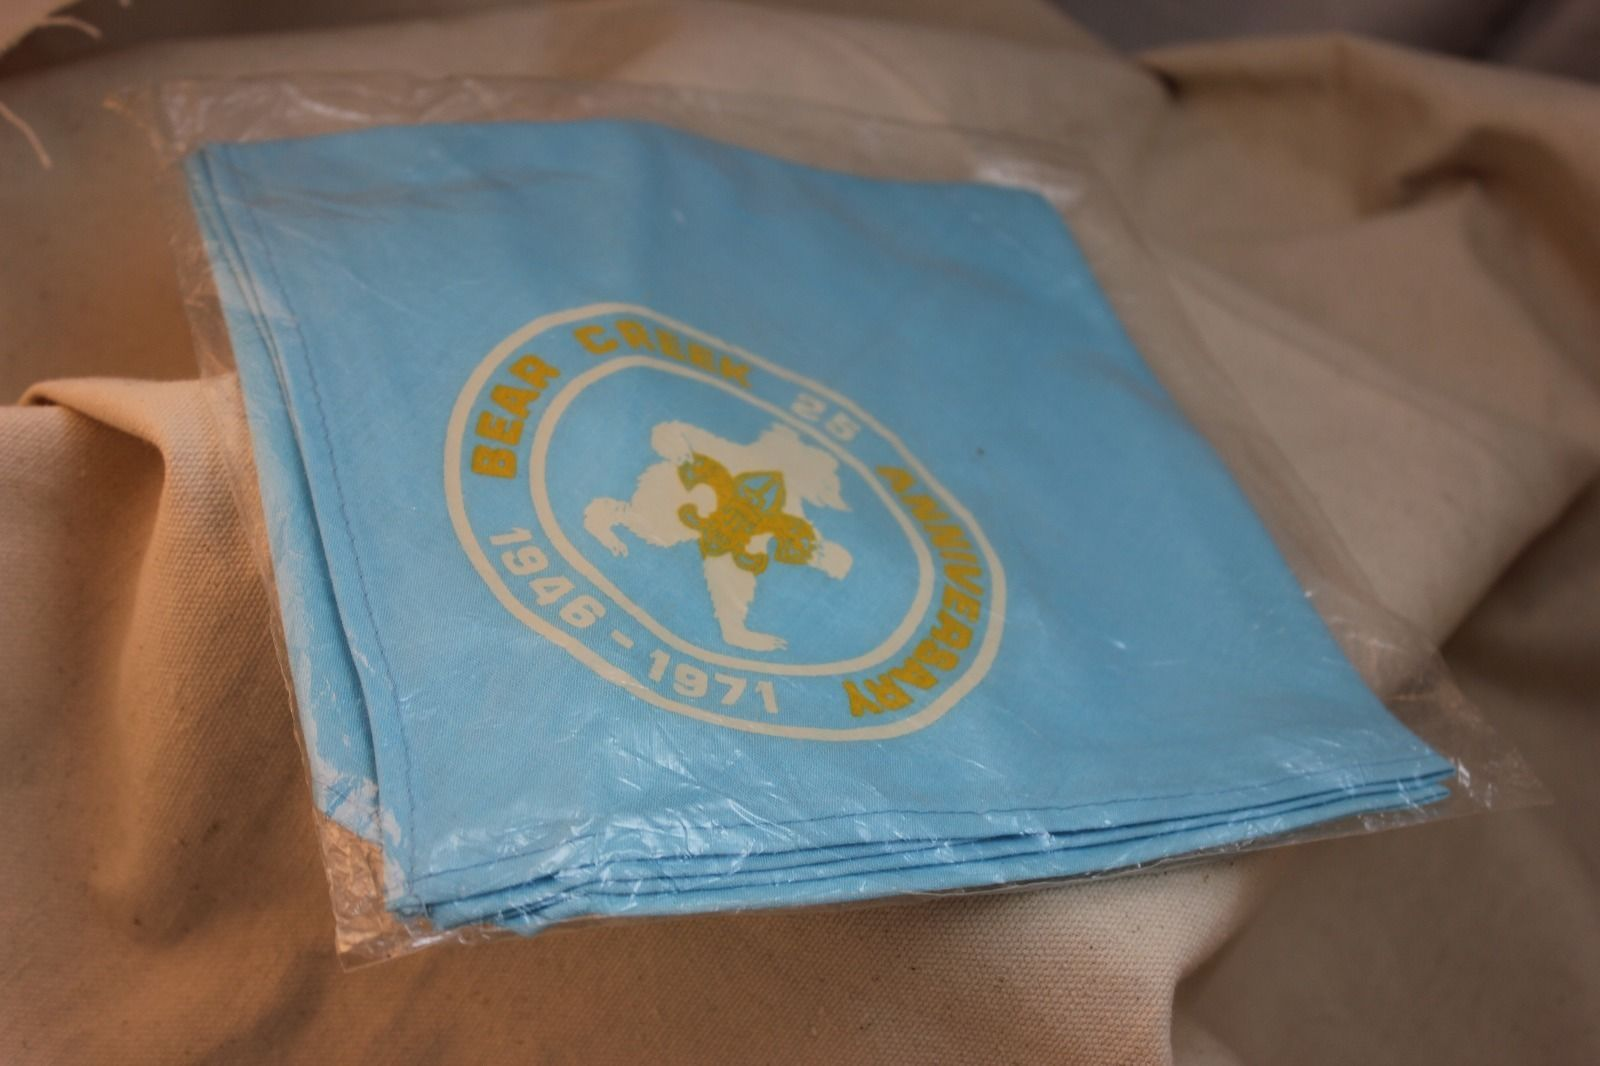 Bear Creek 25th Anniversary Neckerchief And 50 Similar Items